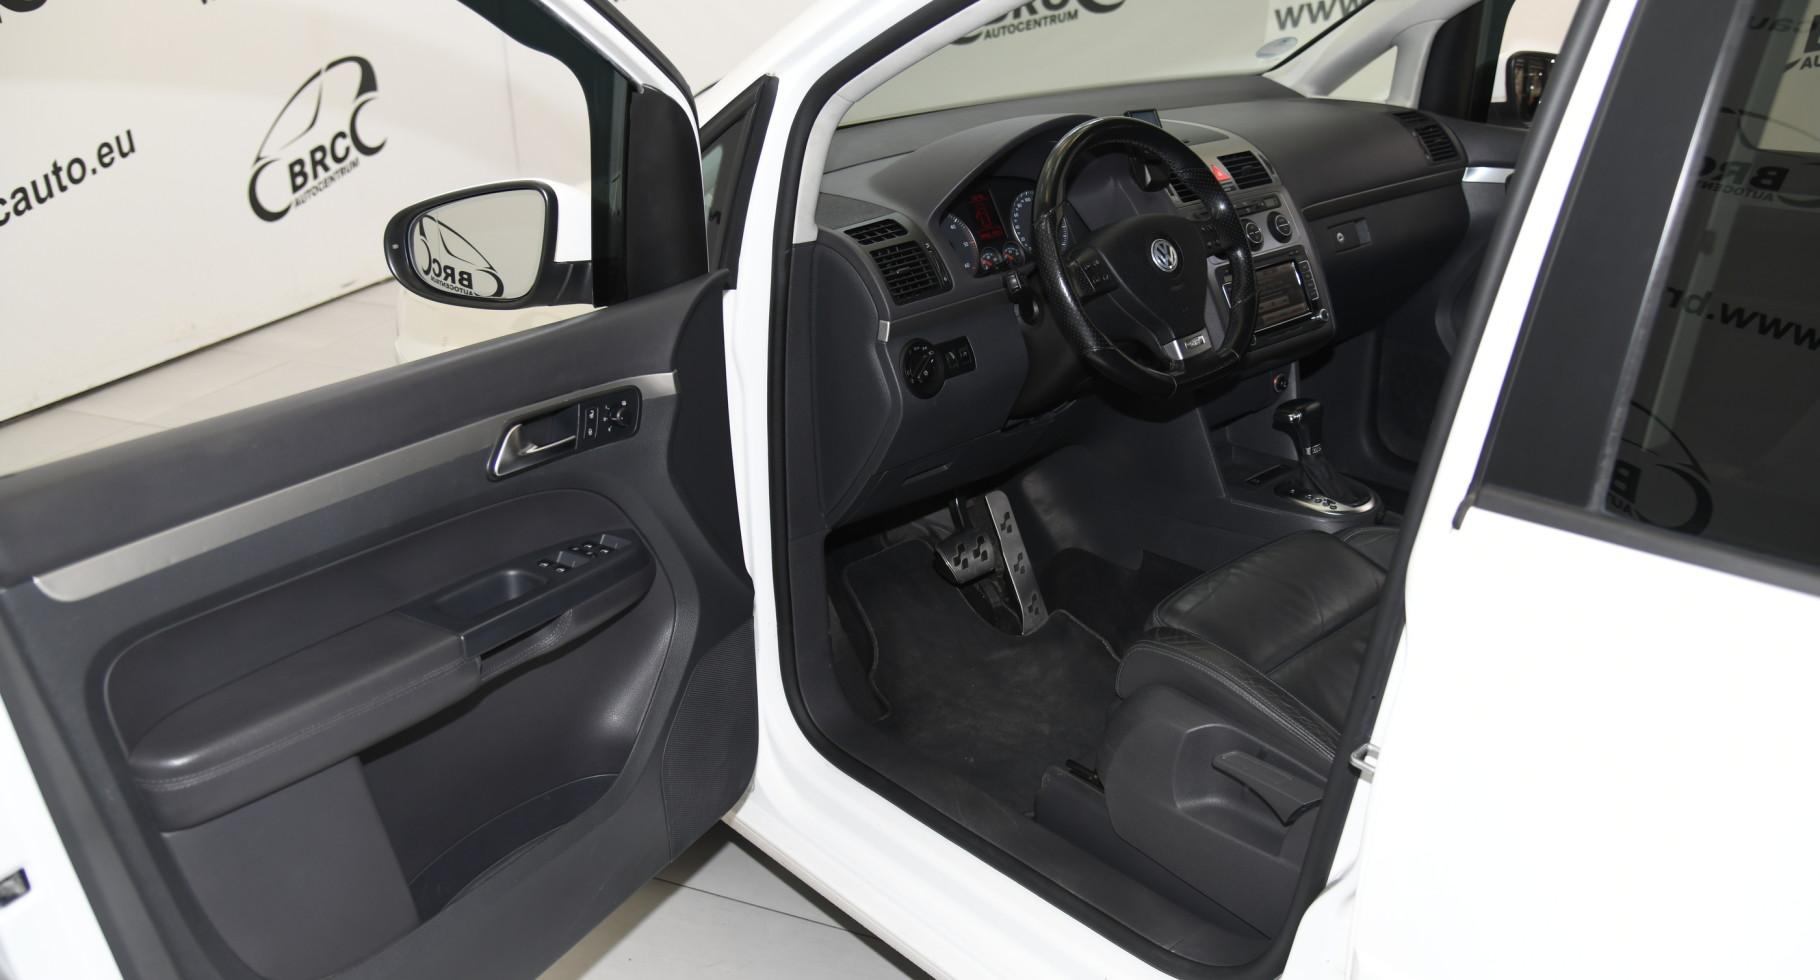 Volkswagen Touran 2.0 TDI Highline DSG Automatas